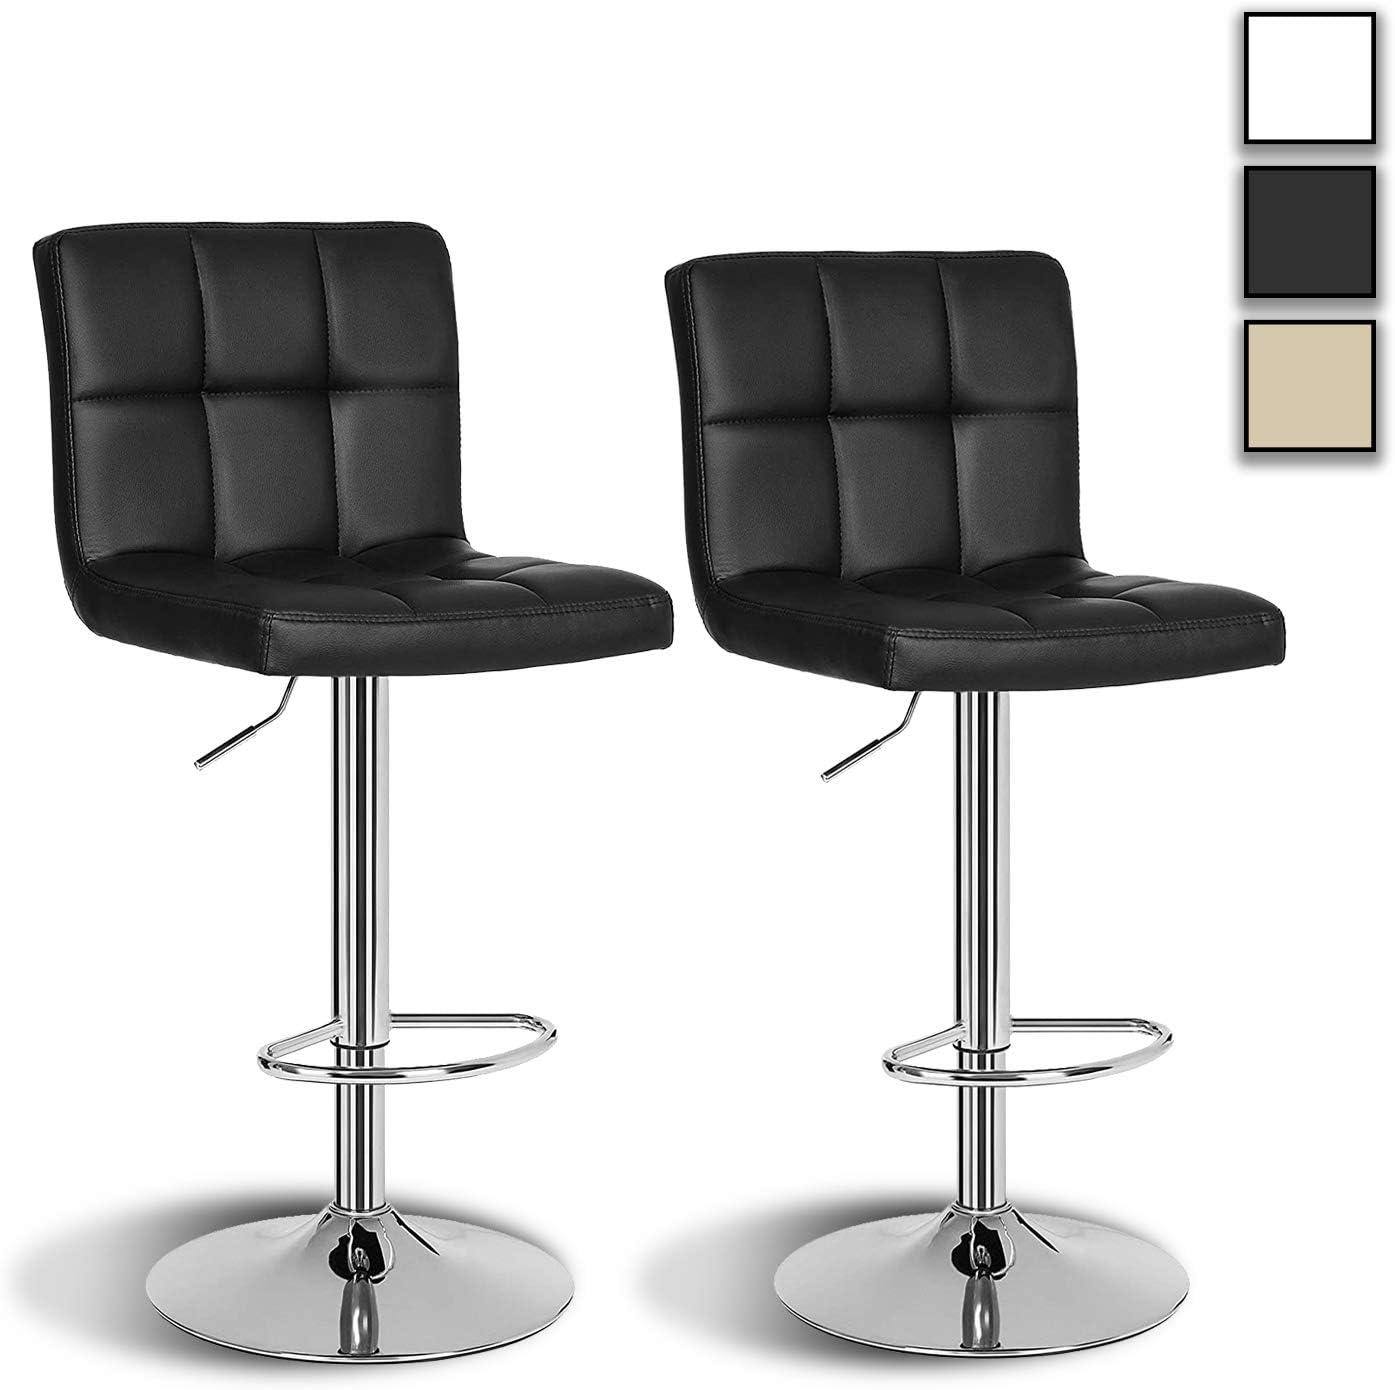 Set of 2 Swivel Bar Stools (BLACK OR BEIGE) WAS £103.72 NOW £63.70 w/code B7RLNOET @ Amazon